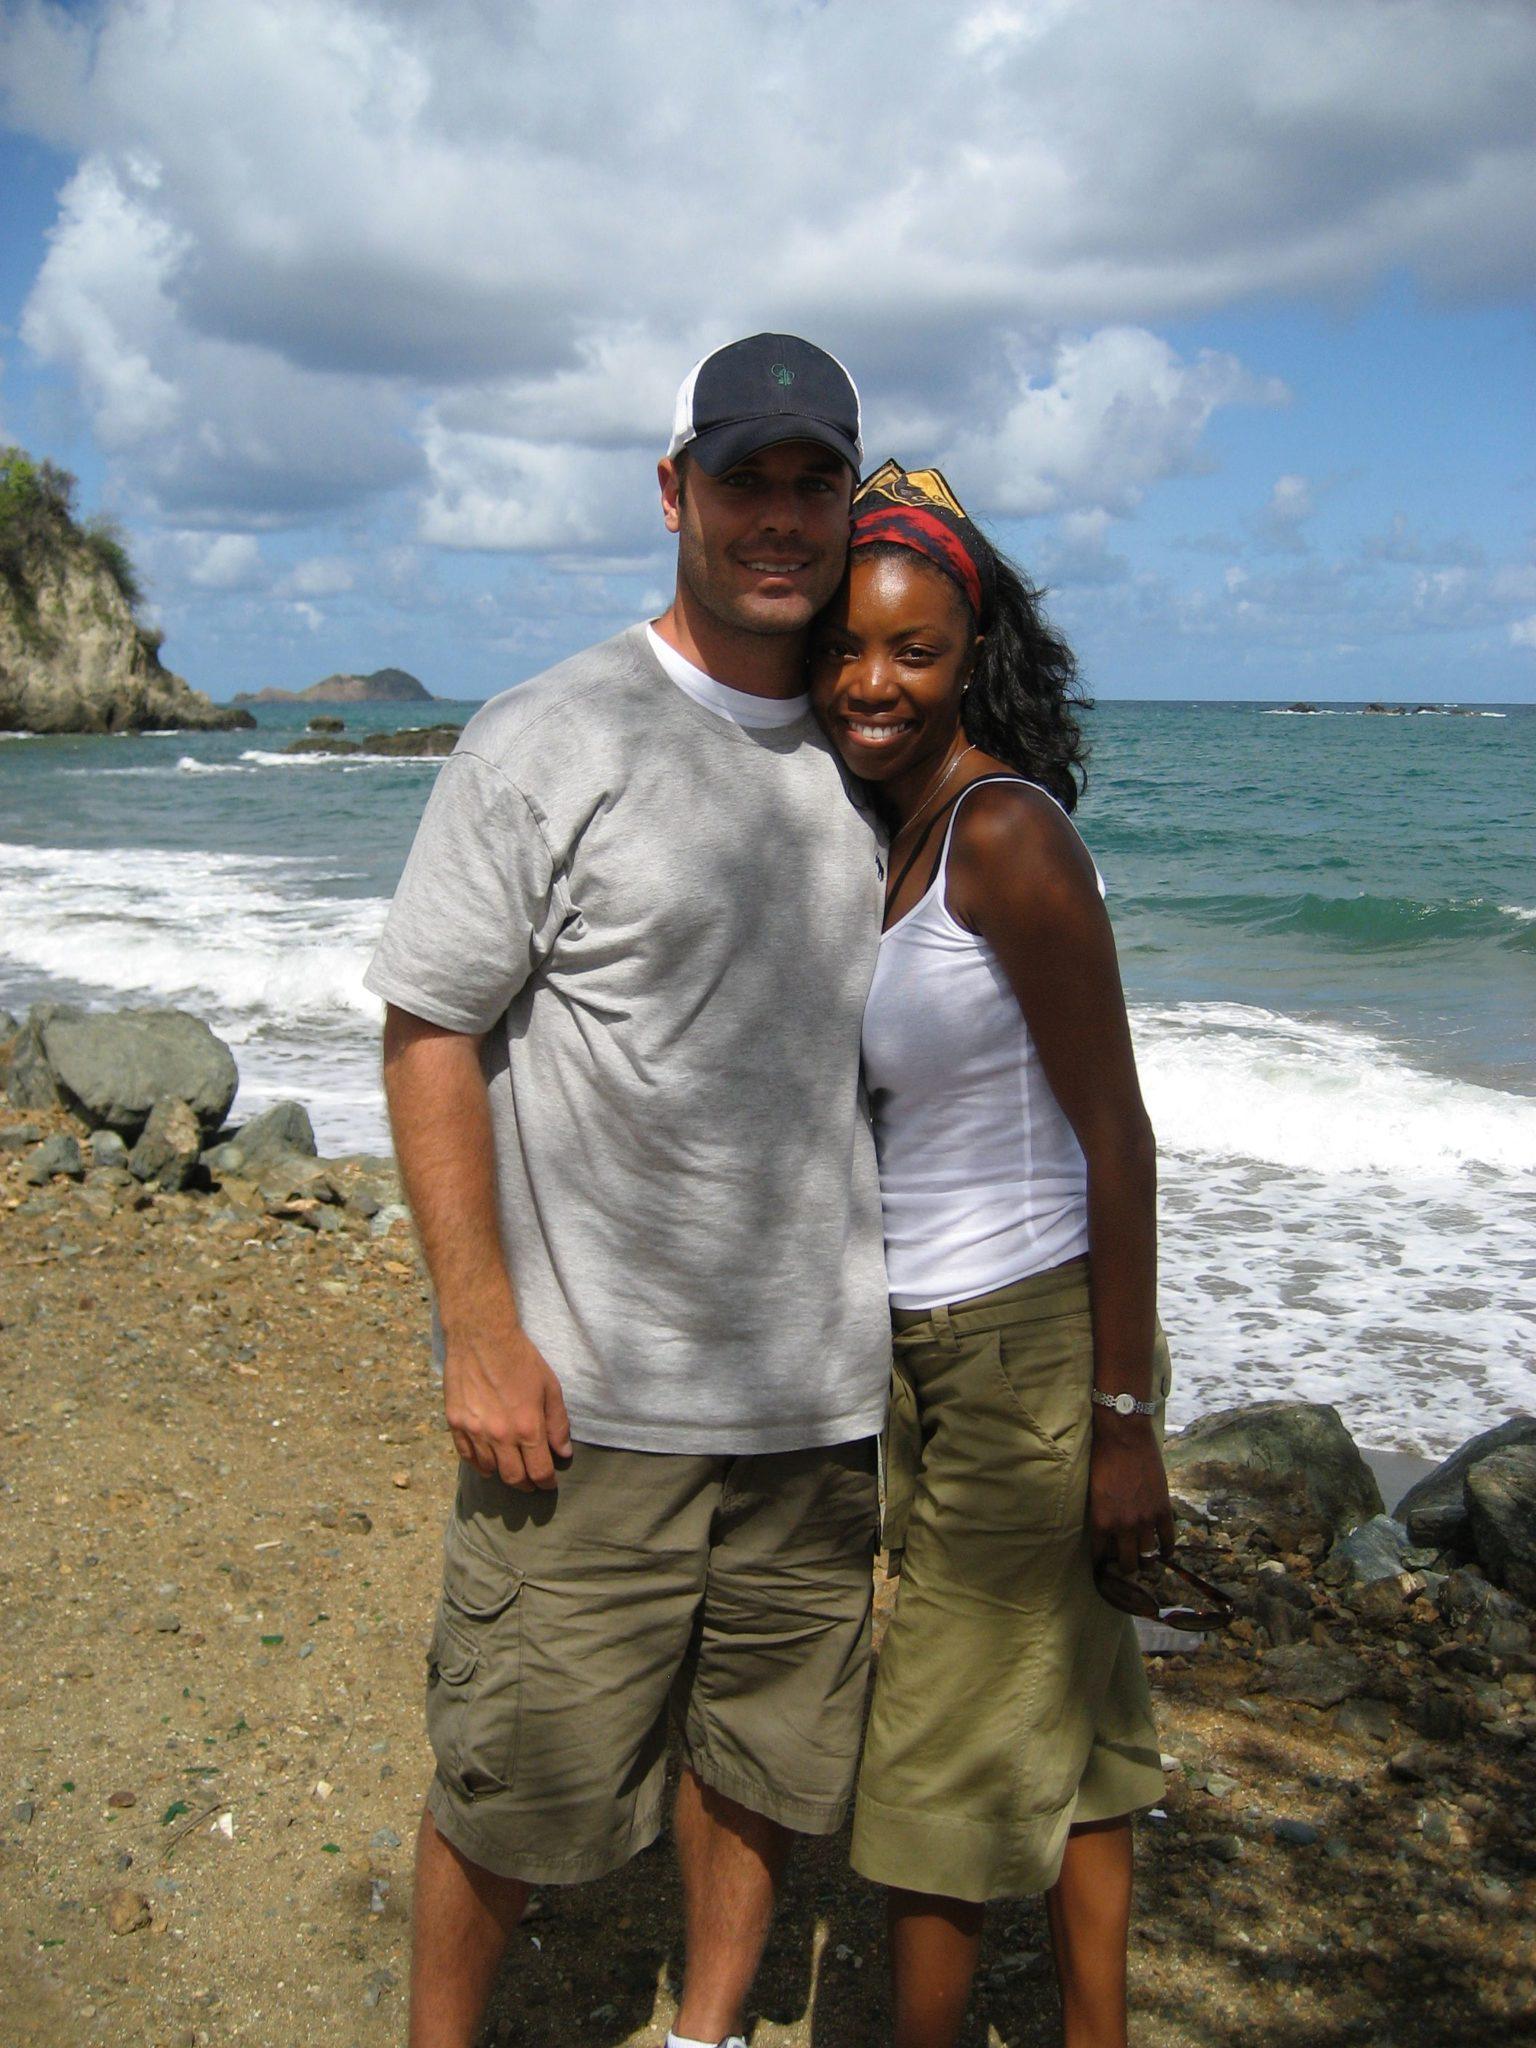 Headley and husband Brian in Tobago. Photograph courtesy Heather Headley